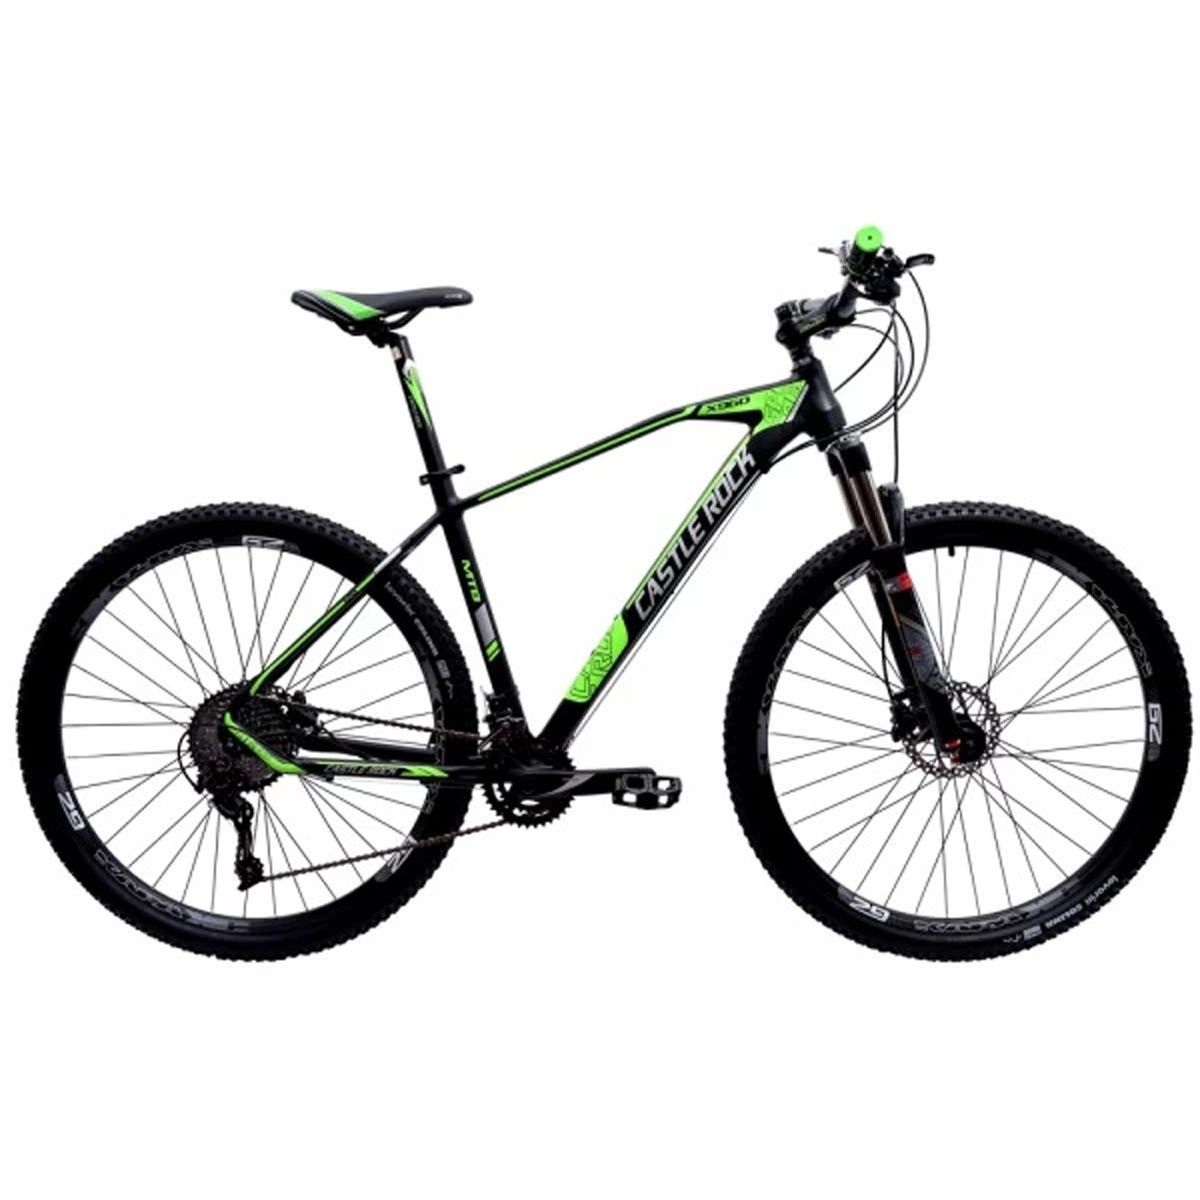 Bicicleta 29 Castle Rock 20V Microshift Preto e Verde